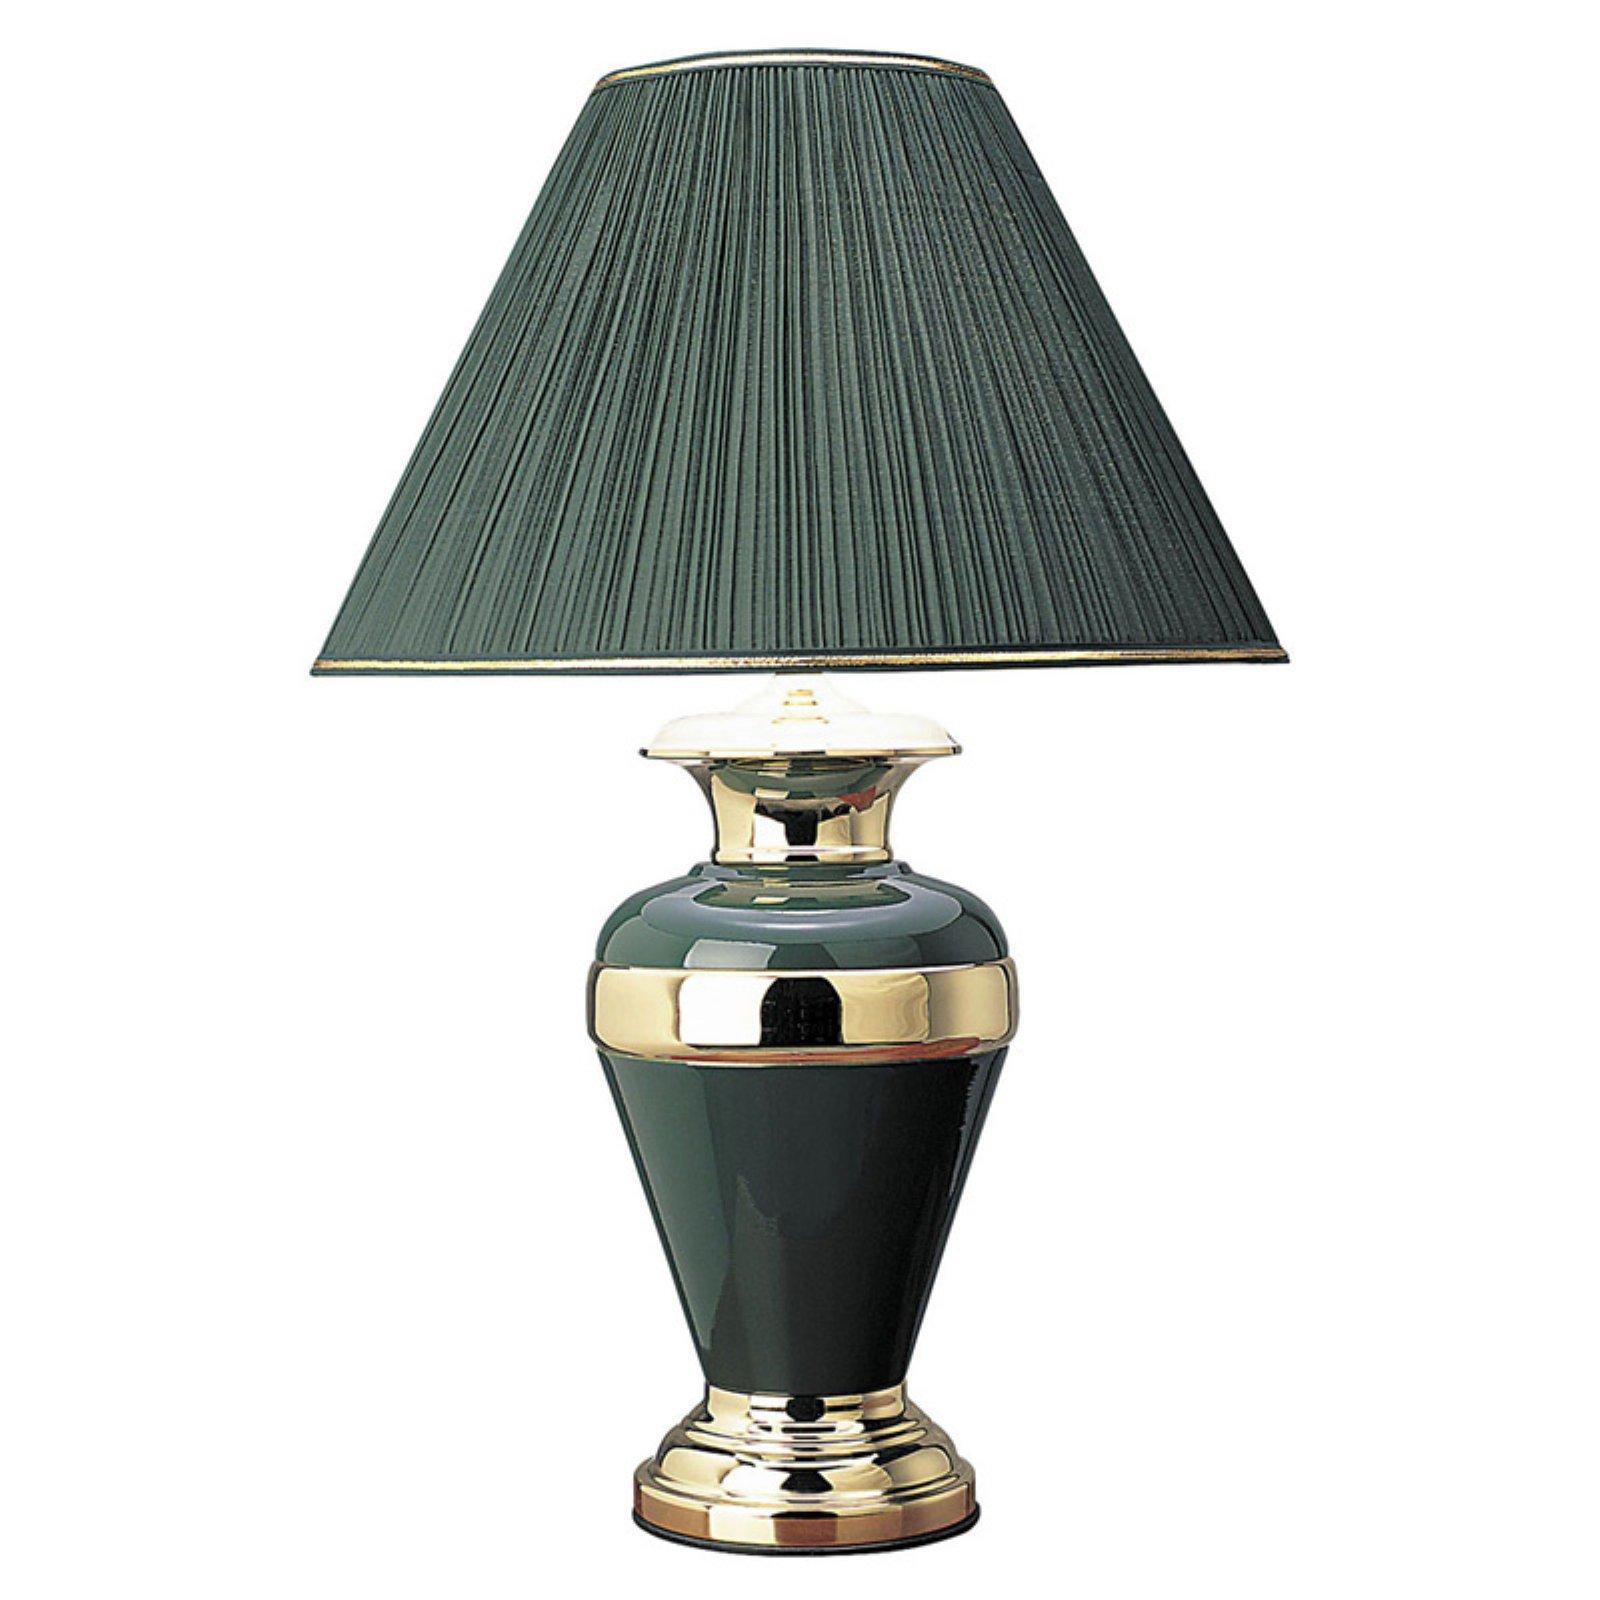 ORE International Metal Table Lamp, Hunter Green